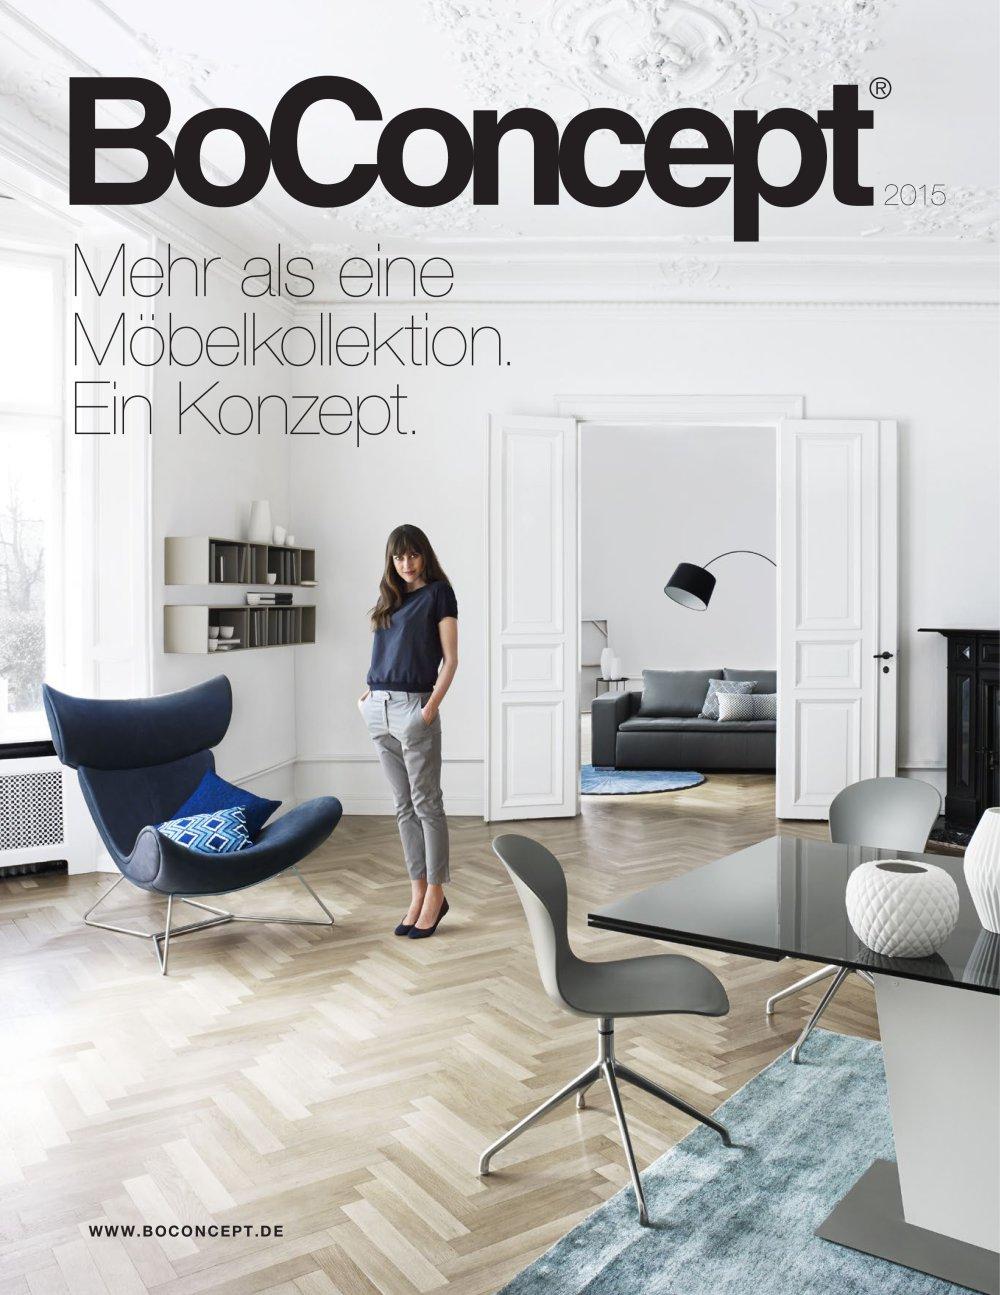 Boconcept Essen boconcept 2015 boconcept pdf katalog beschreibung prospekt